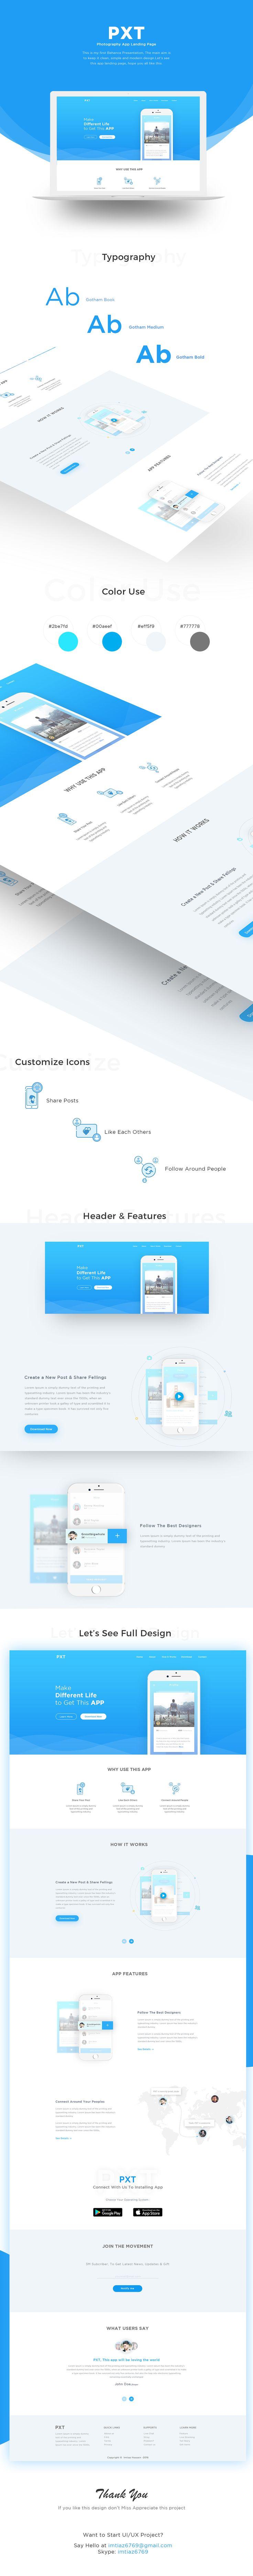 PXT (App Landing Page) on Behance